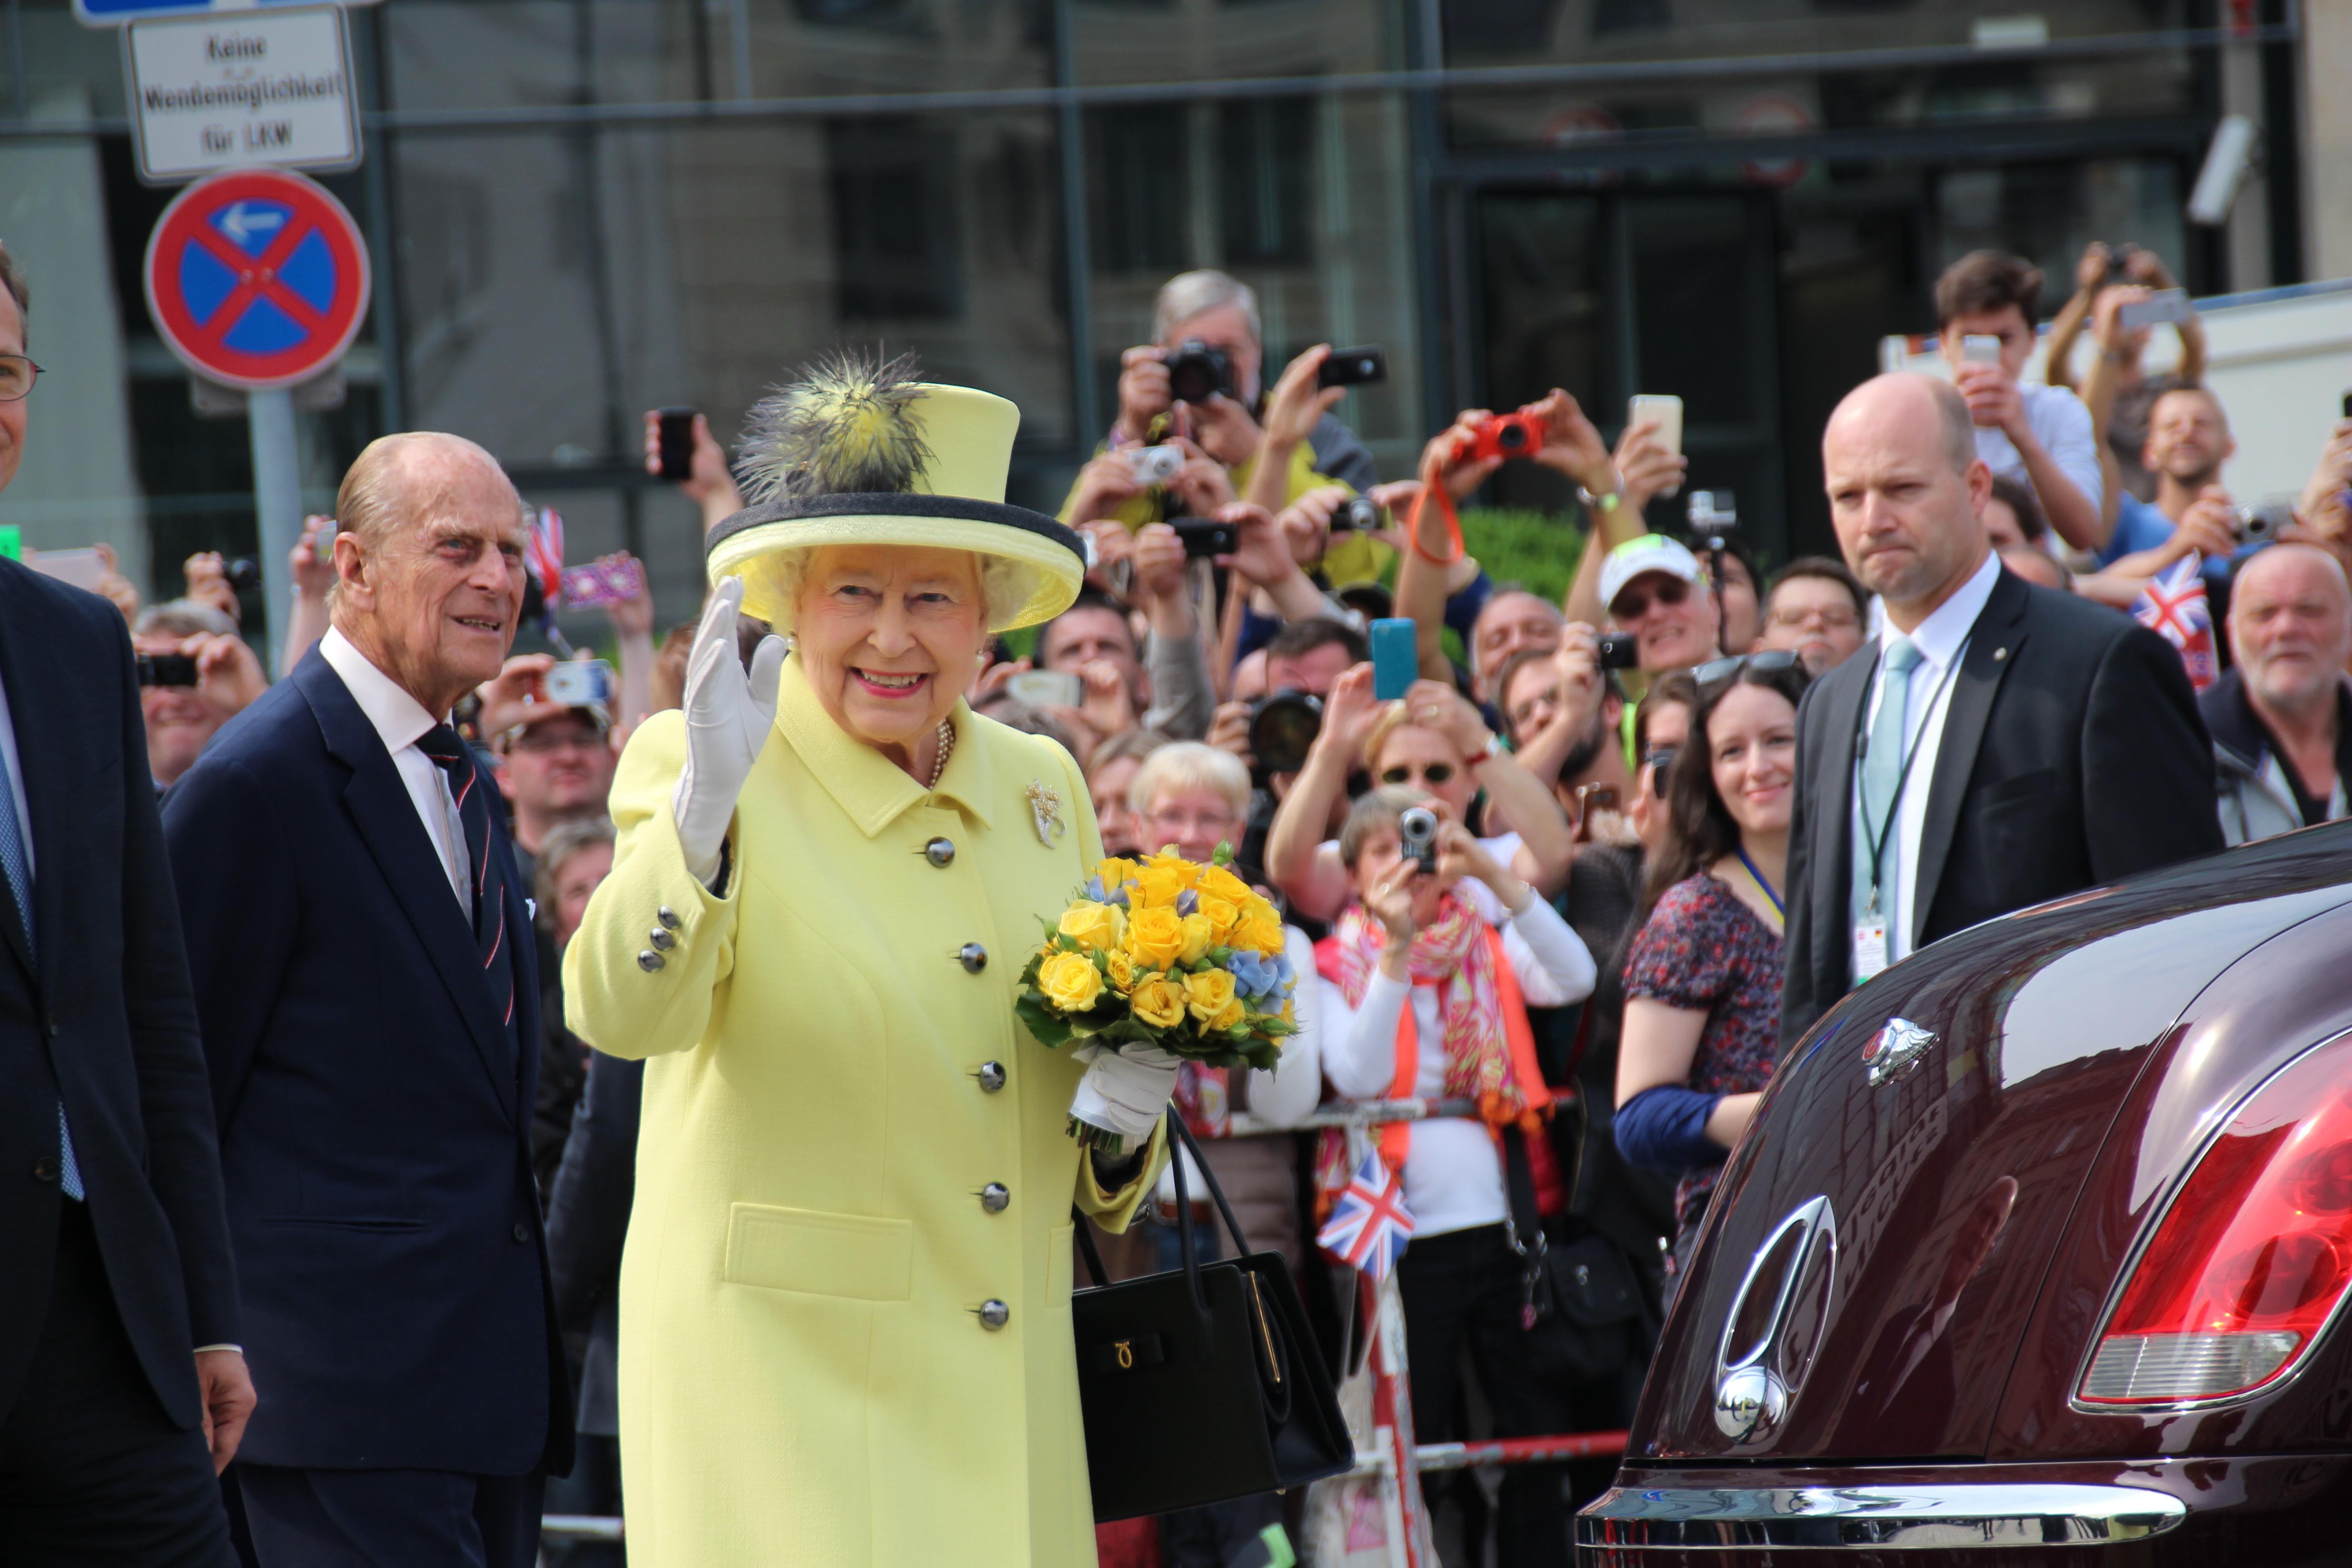 Depiction of Isabel II del Reino Unido